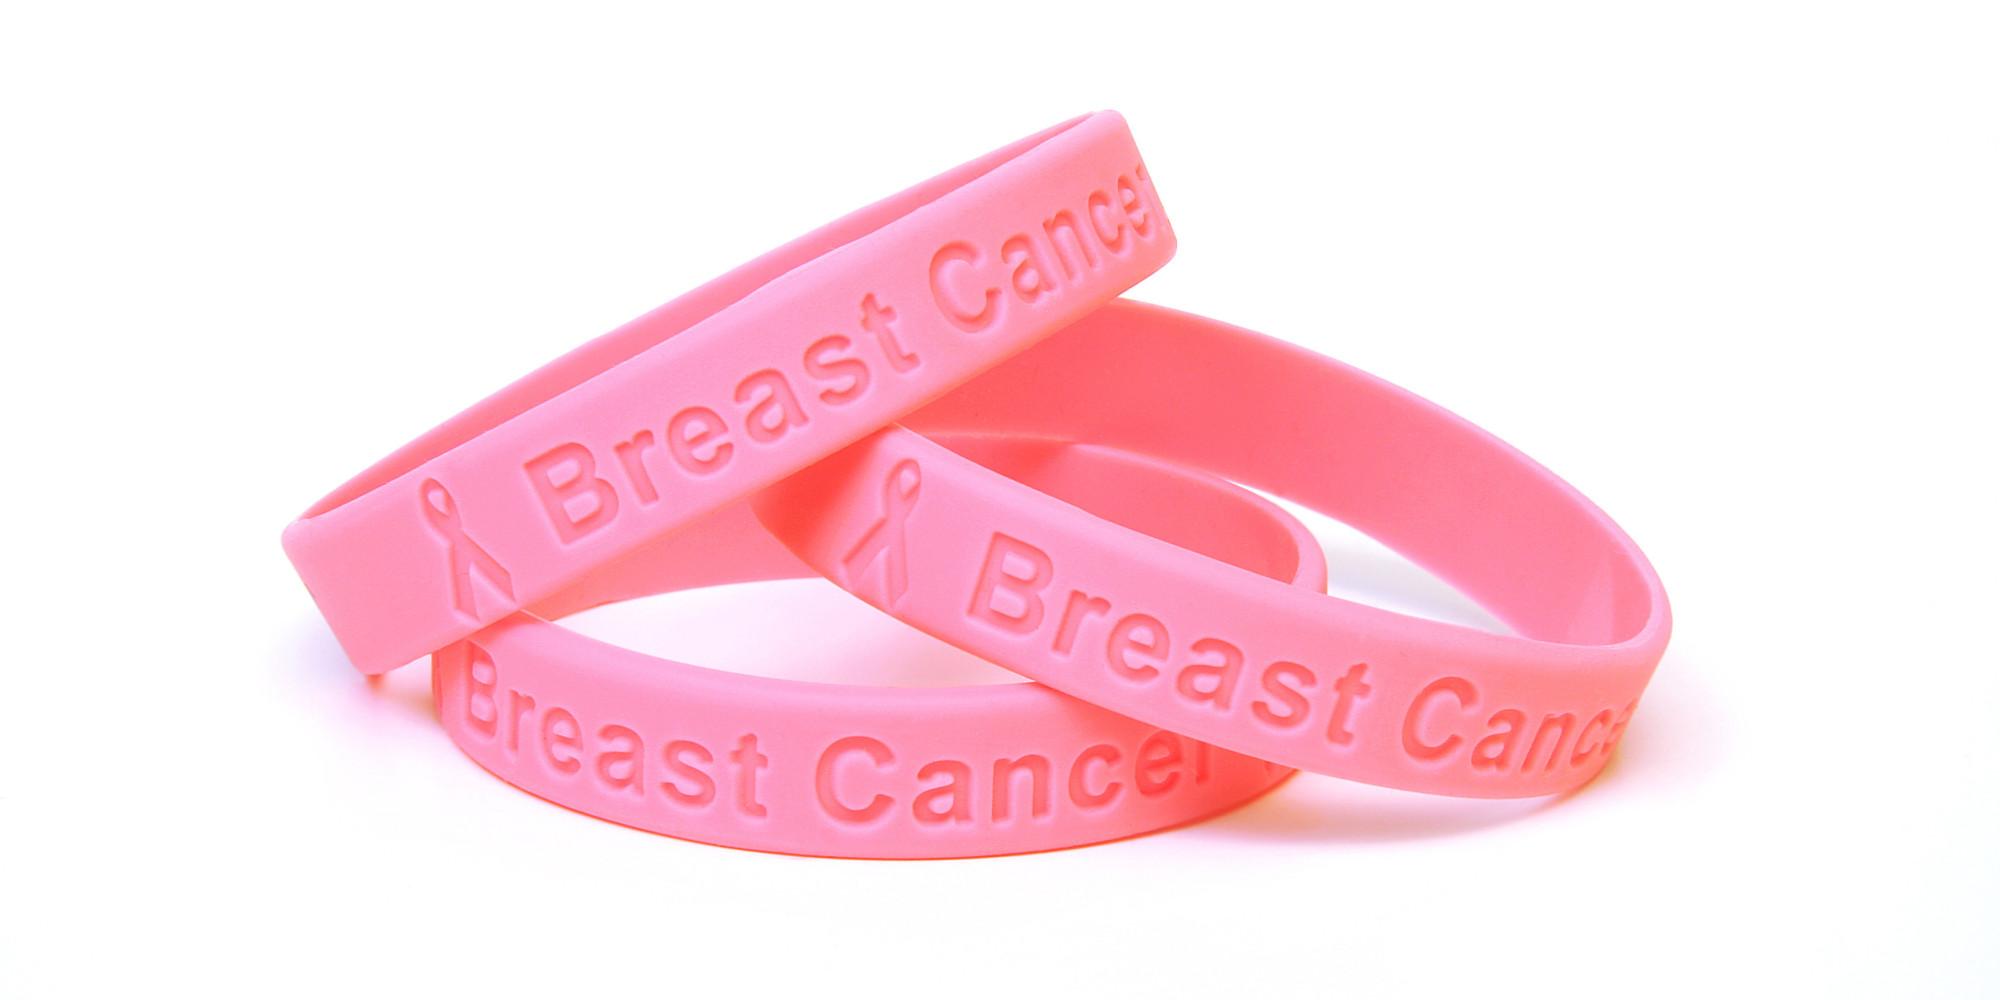 Breast cancer awareness wristband uk